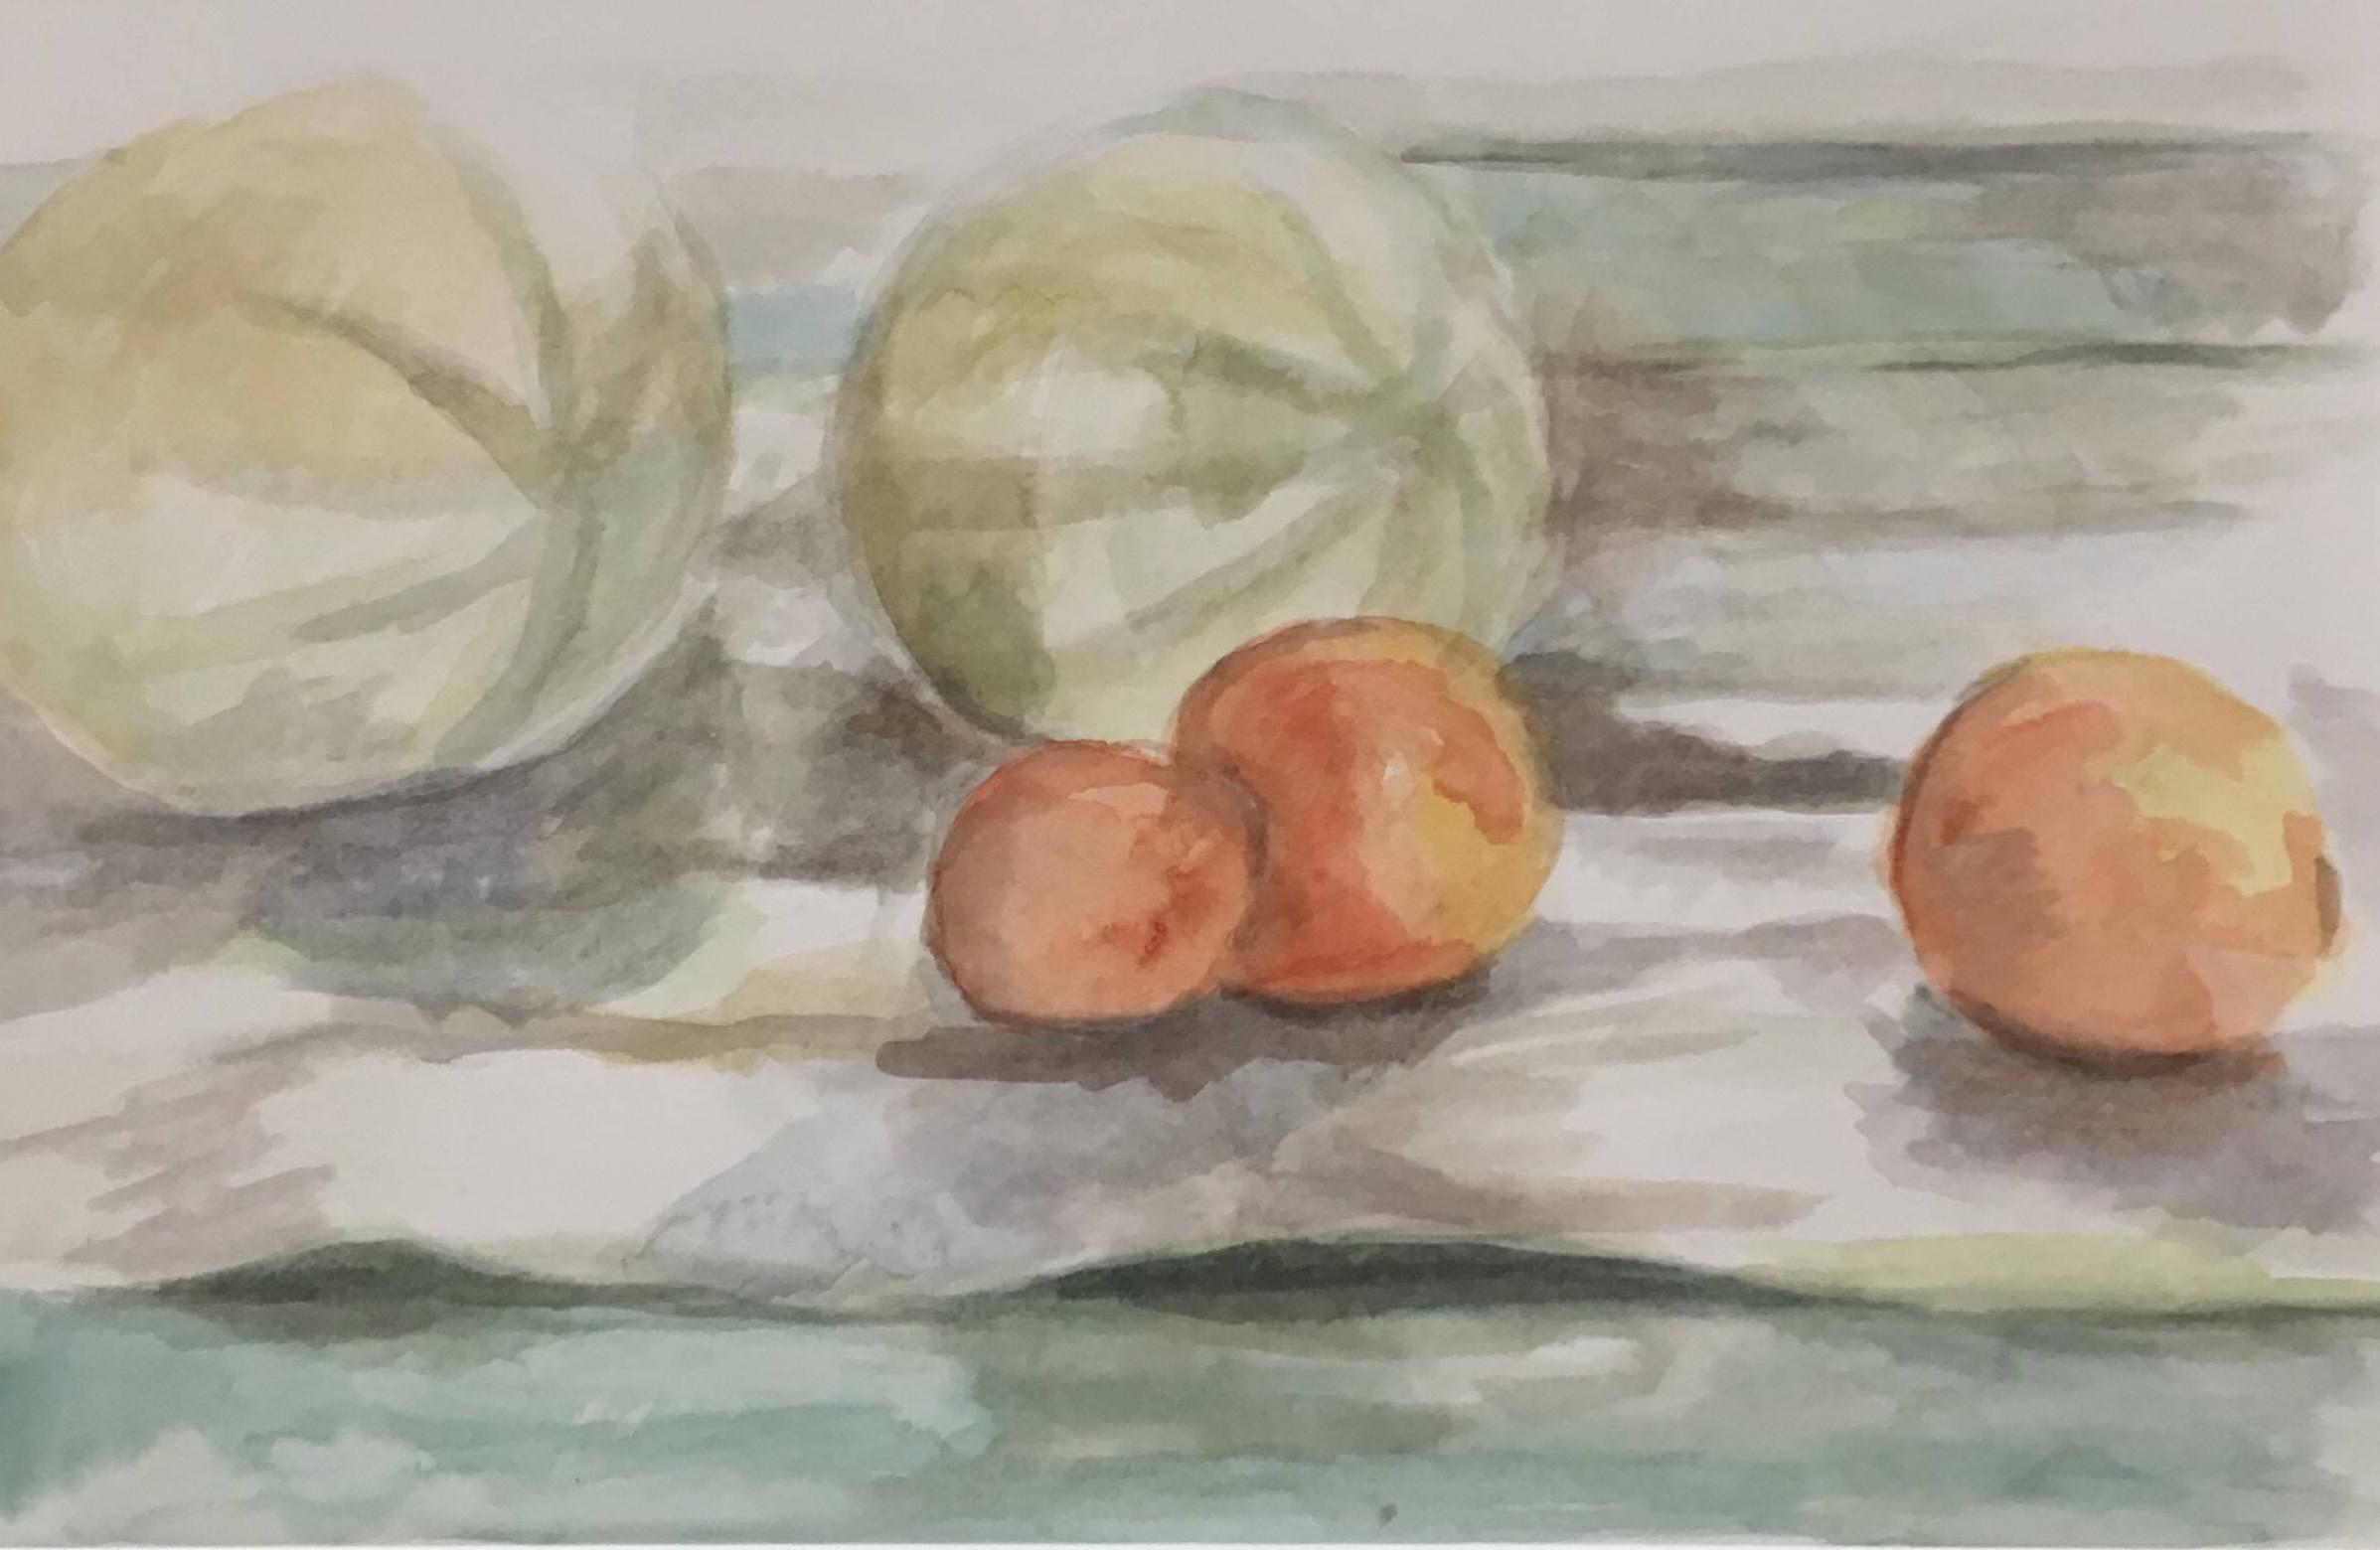 melons france